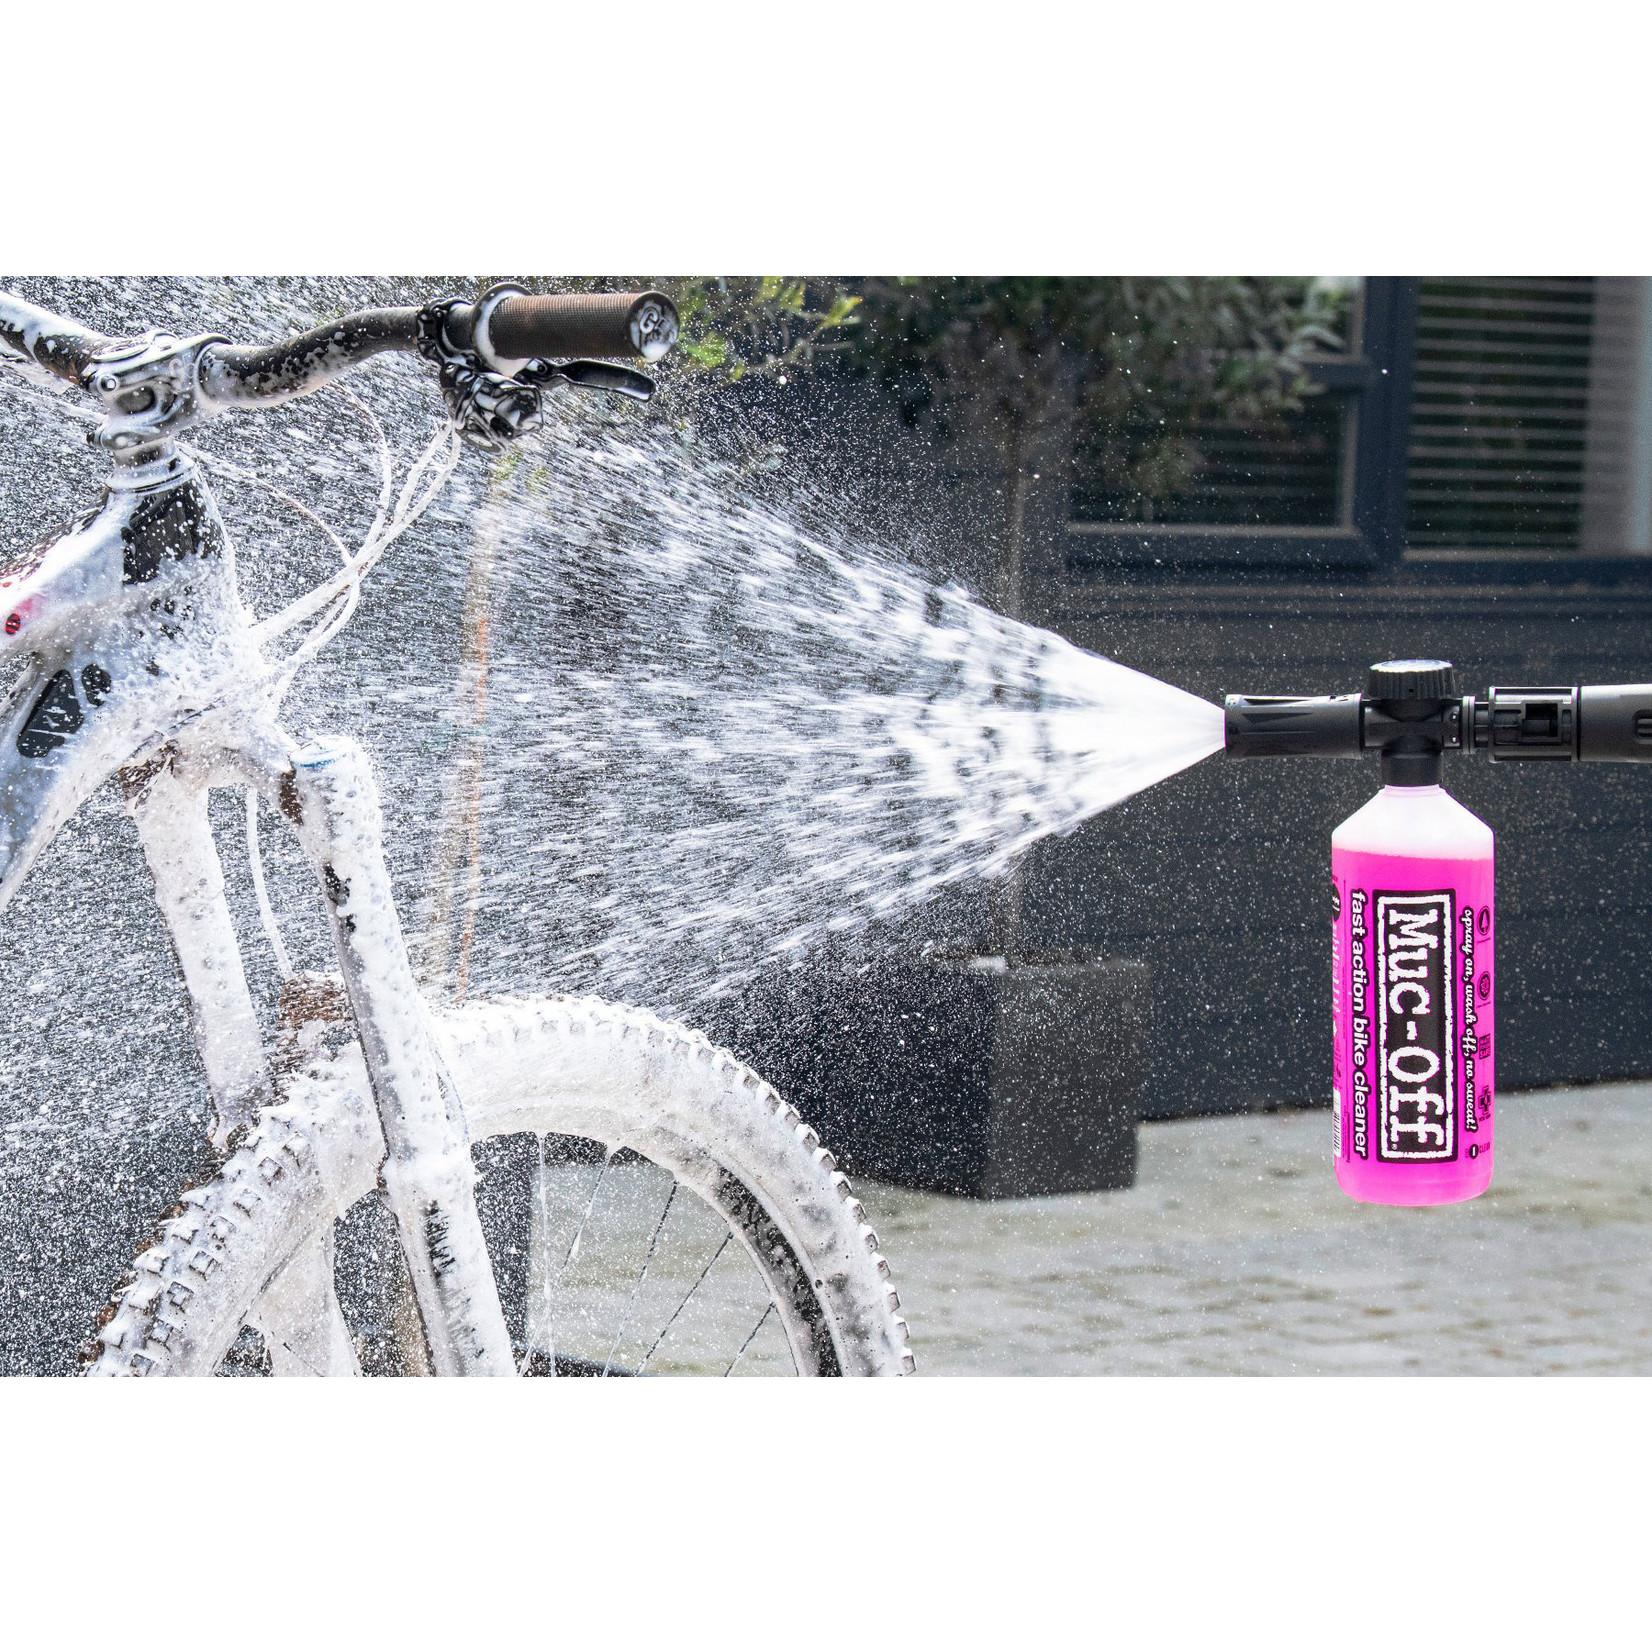 muc-off Muc-Off Pressure Washer Bicycle Bundle